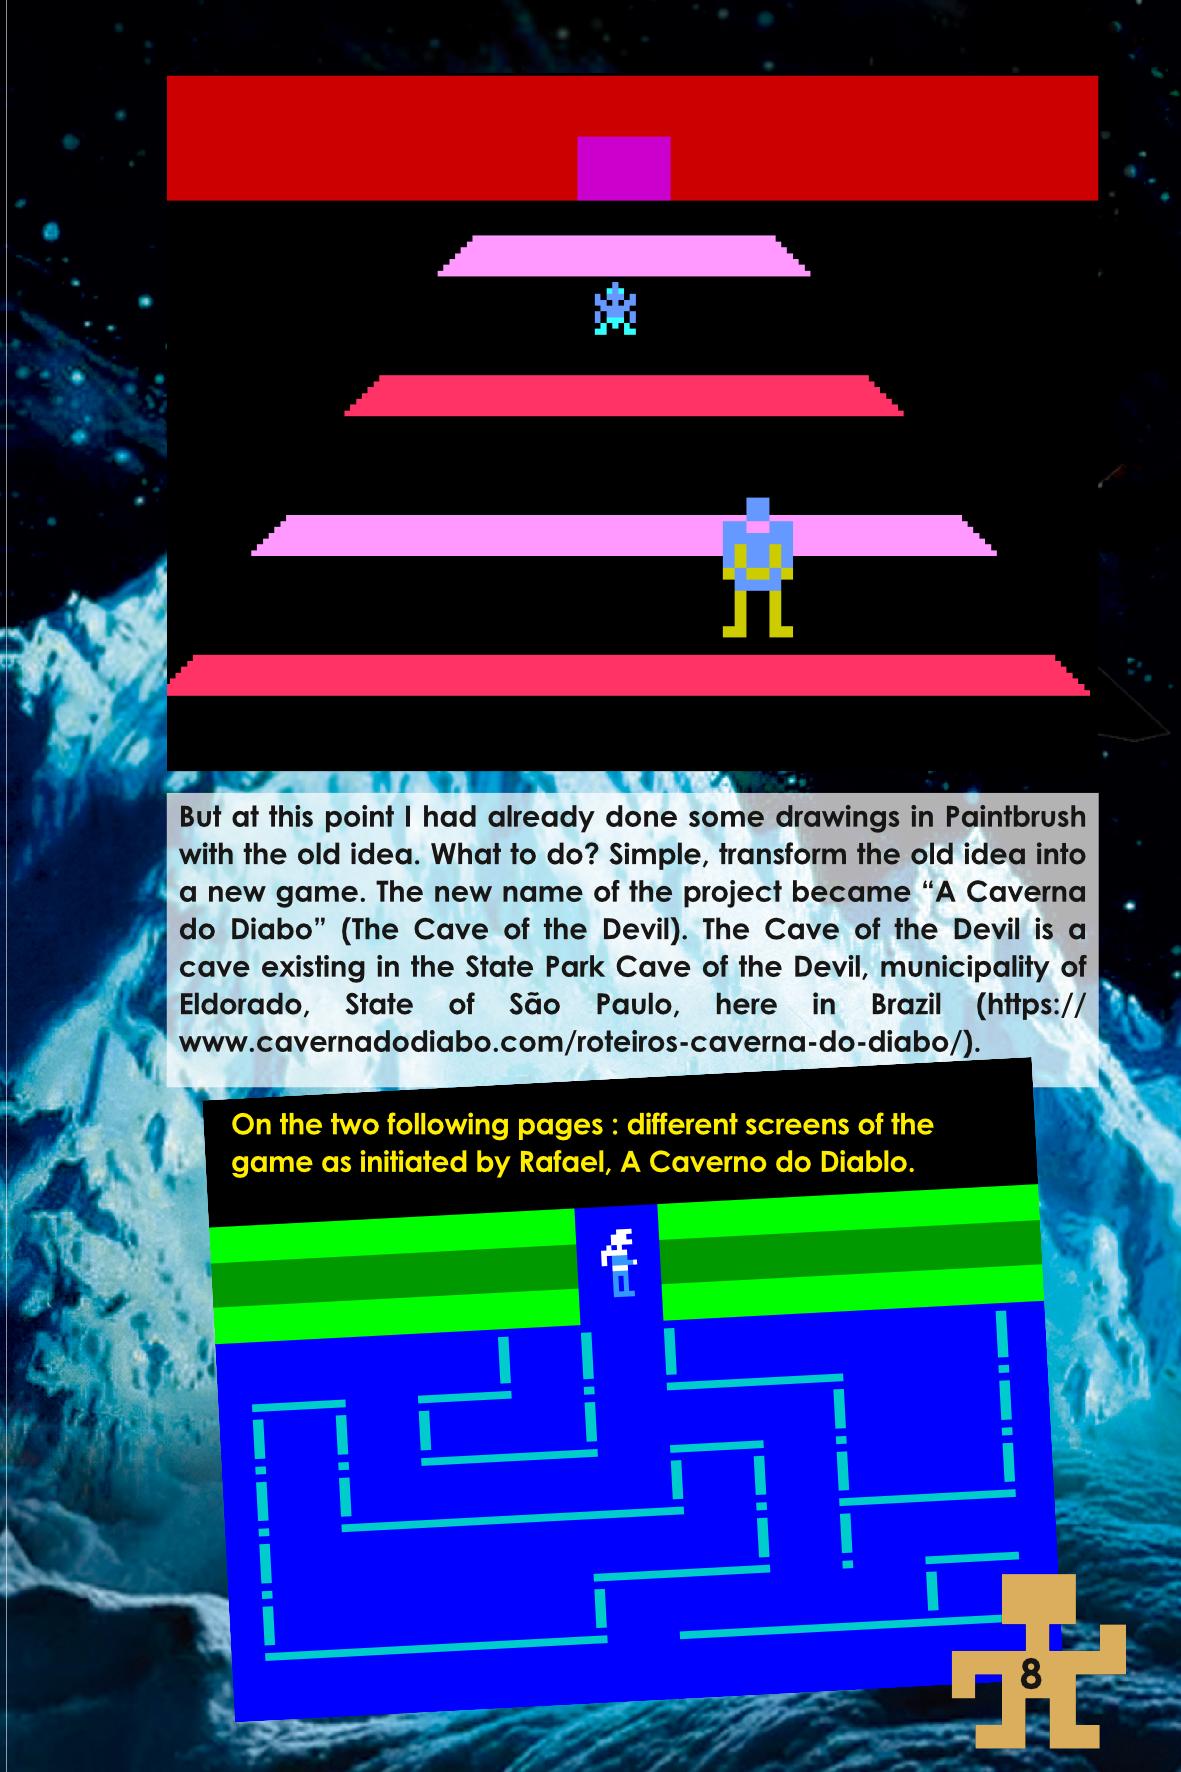 Frozen Fort Odyssey 2 Videopac Instruction Manual sample 2